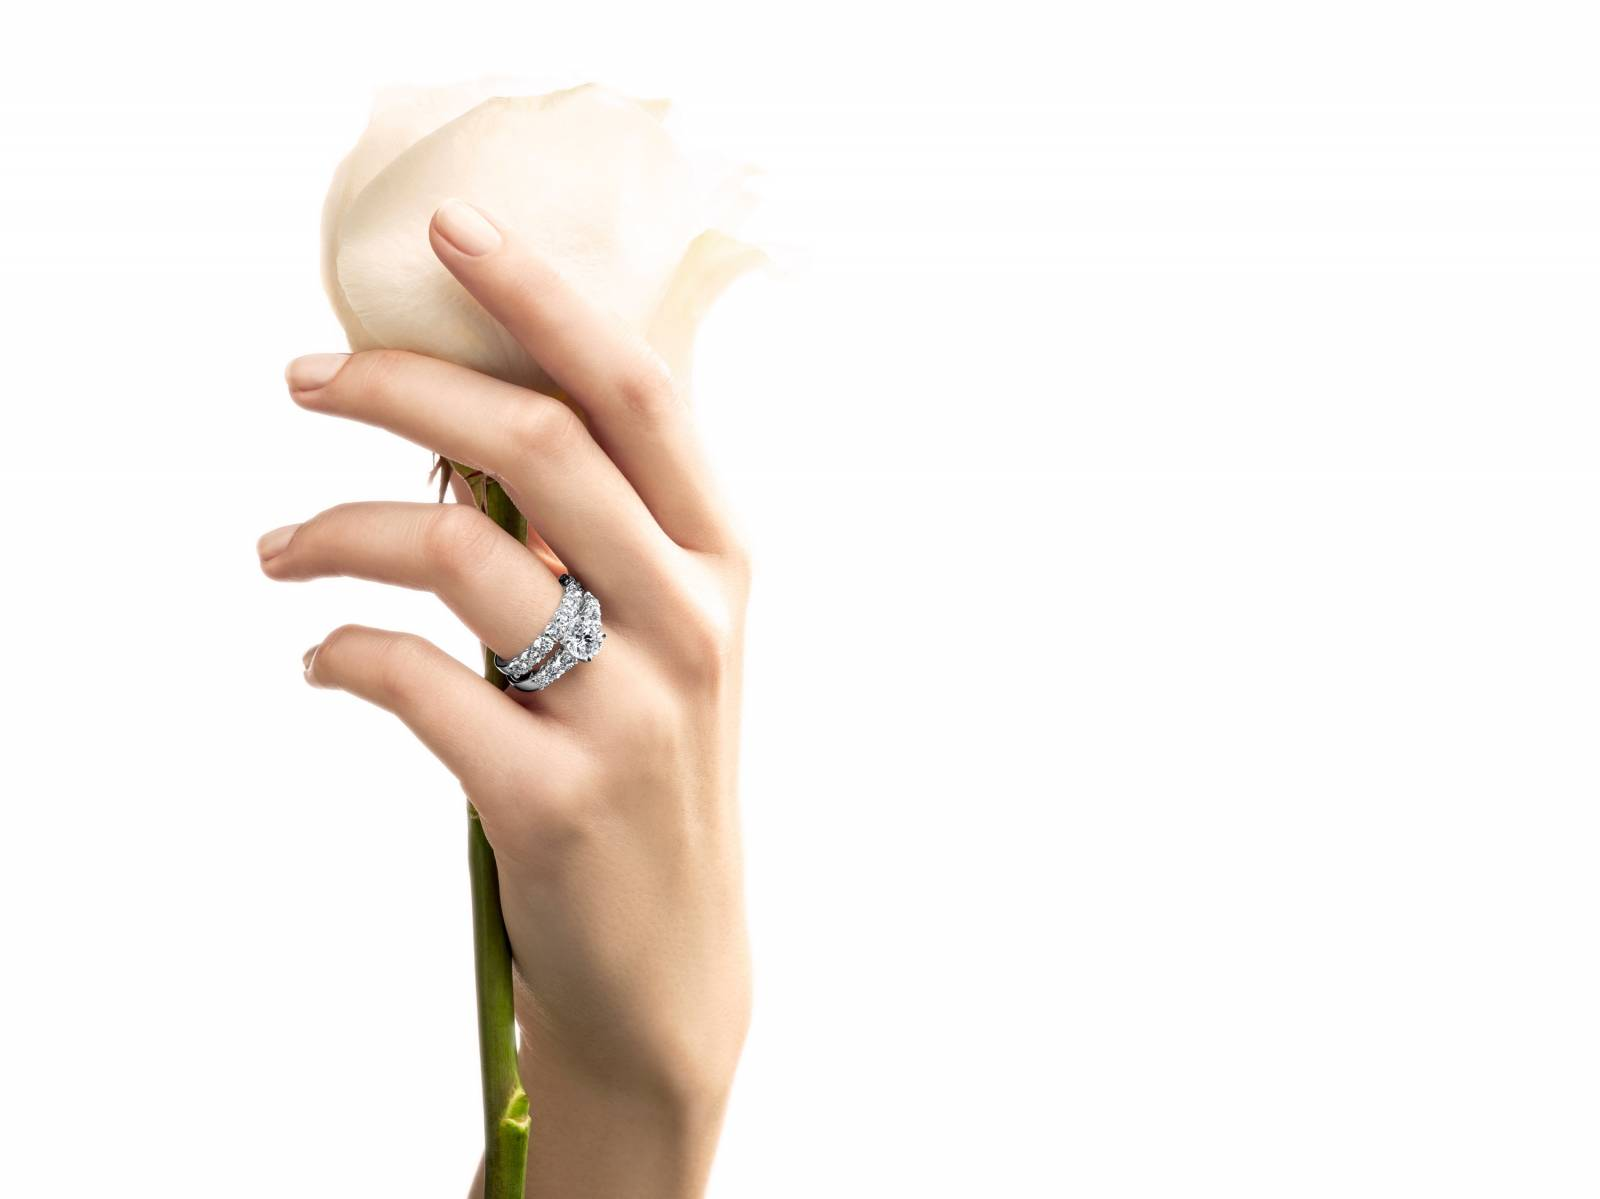 Juwelier Martens - Verlovingsringen - Trouwringen - Juwelen huwelijk - House of Weddings - 6